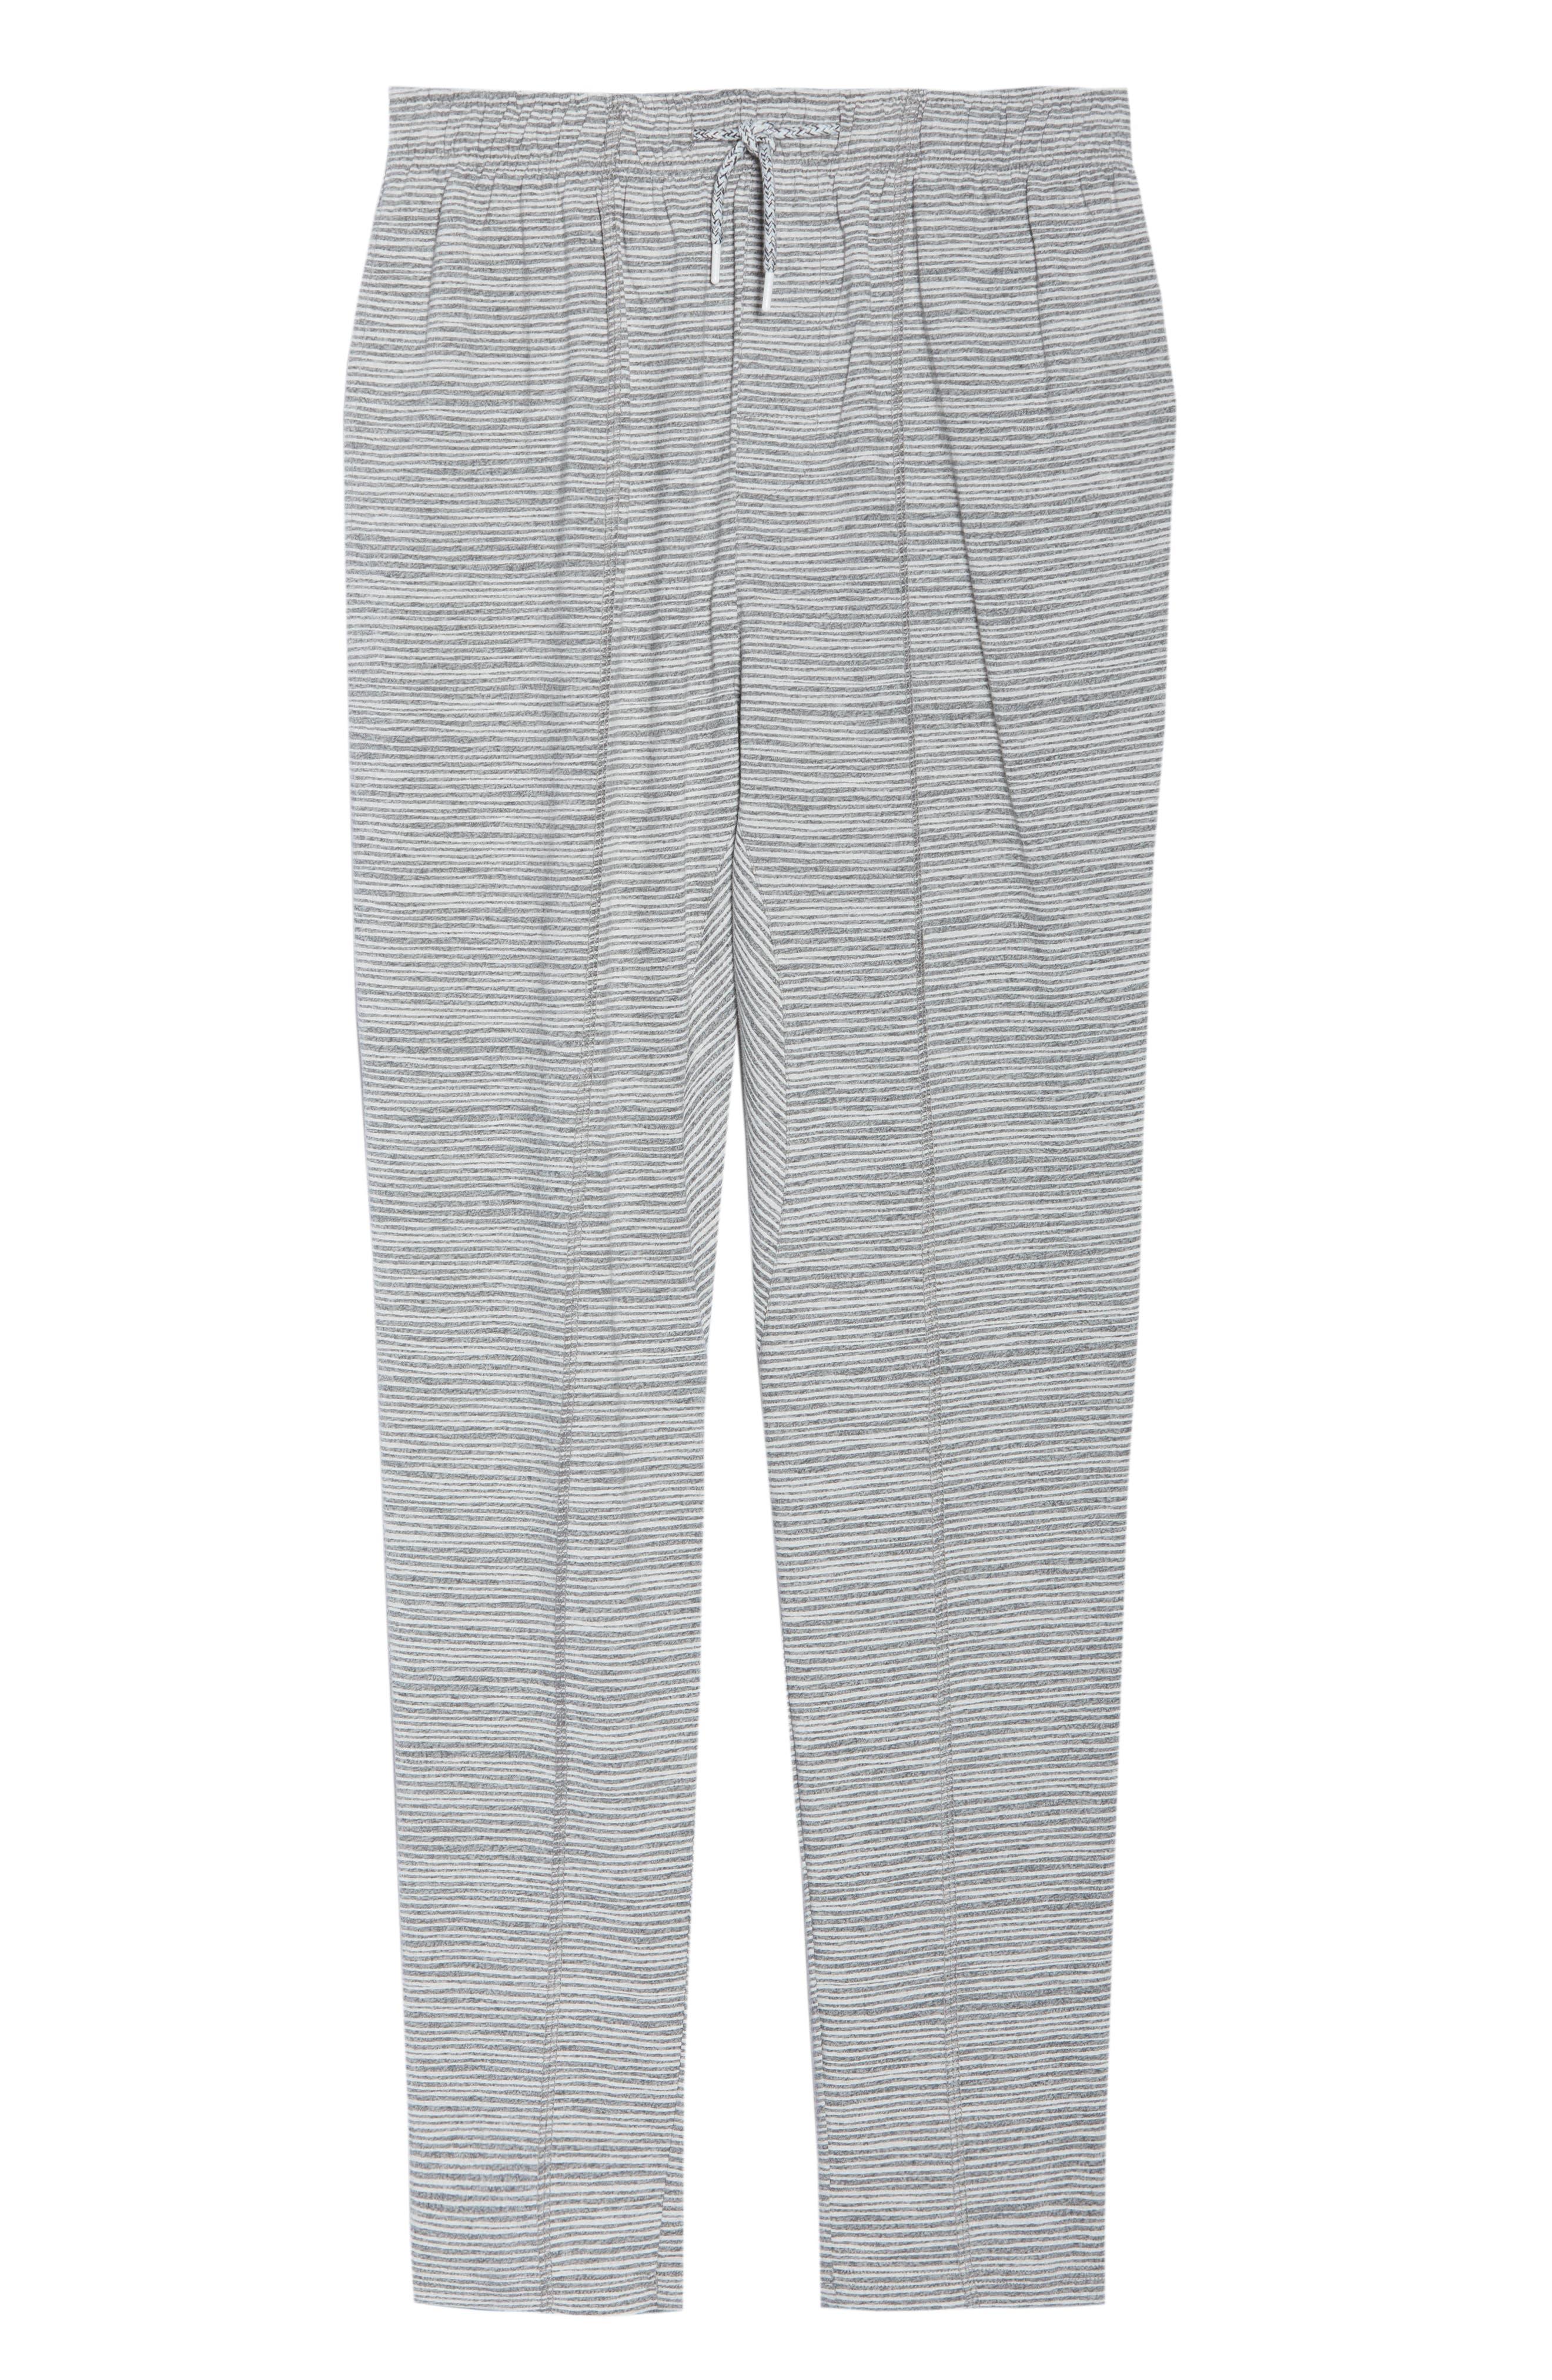 CHALMERS,                             Ash Stripe Lounge Pants,                             Alternate thumbnail 6, color,                             033